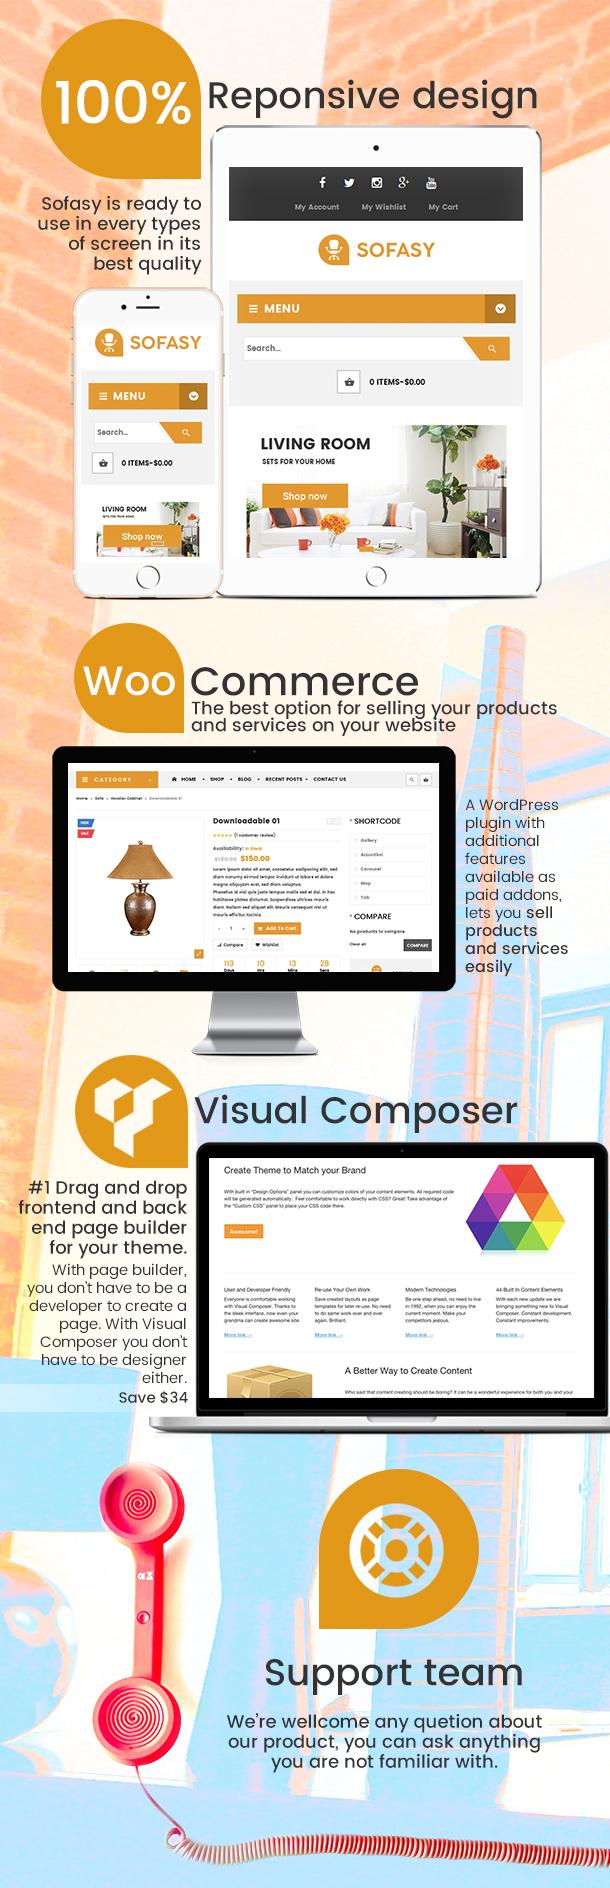 VG Sofasy - Responsive WooCommerce WordPress Theme - 20